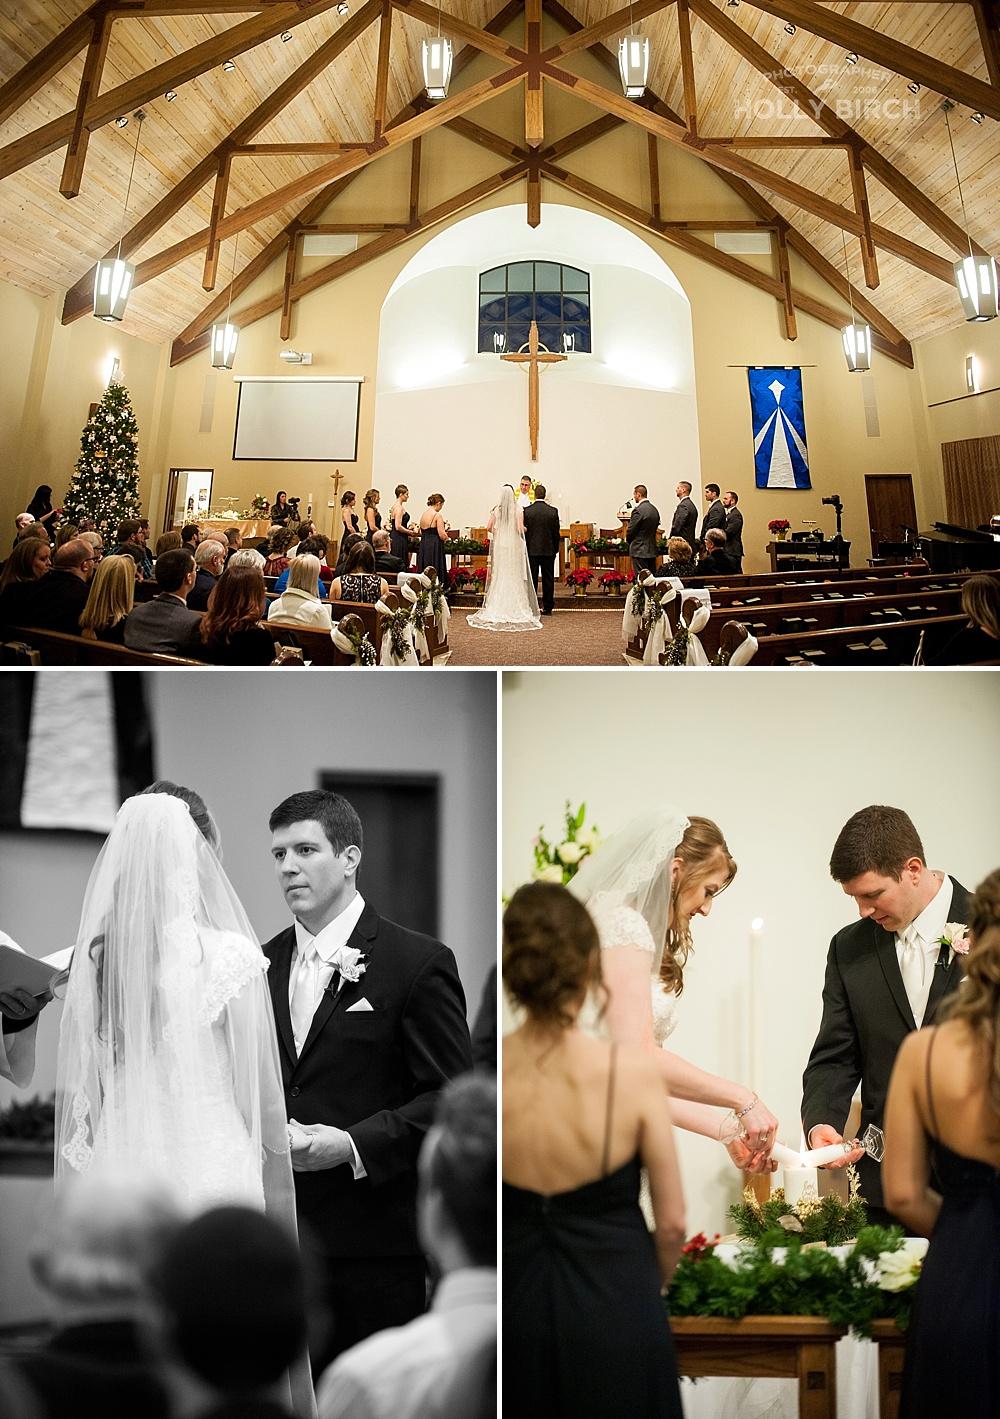 Bloomington-Normal-wedding-Holiday-Inn-airport-wedding_3138.jpg